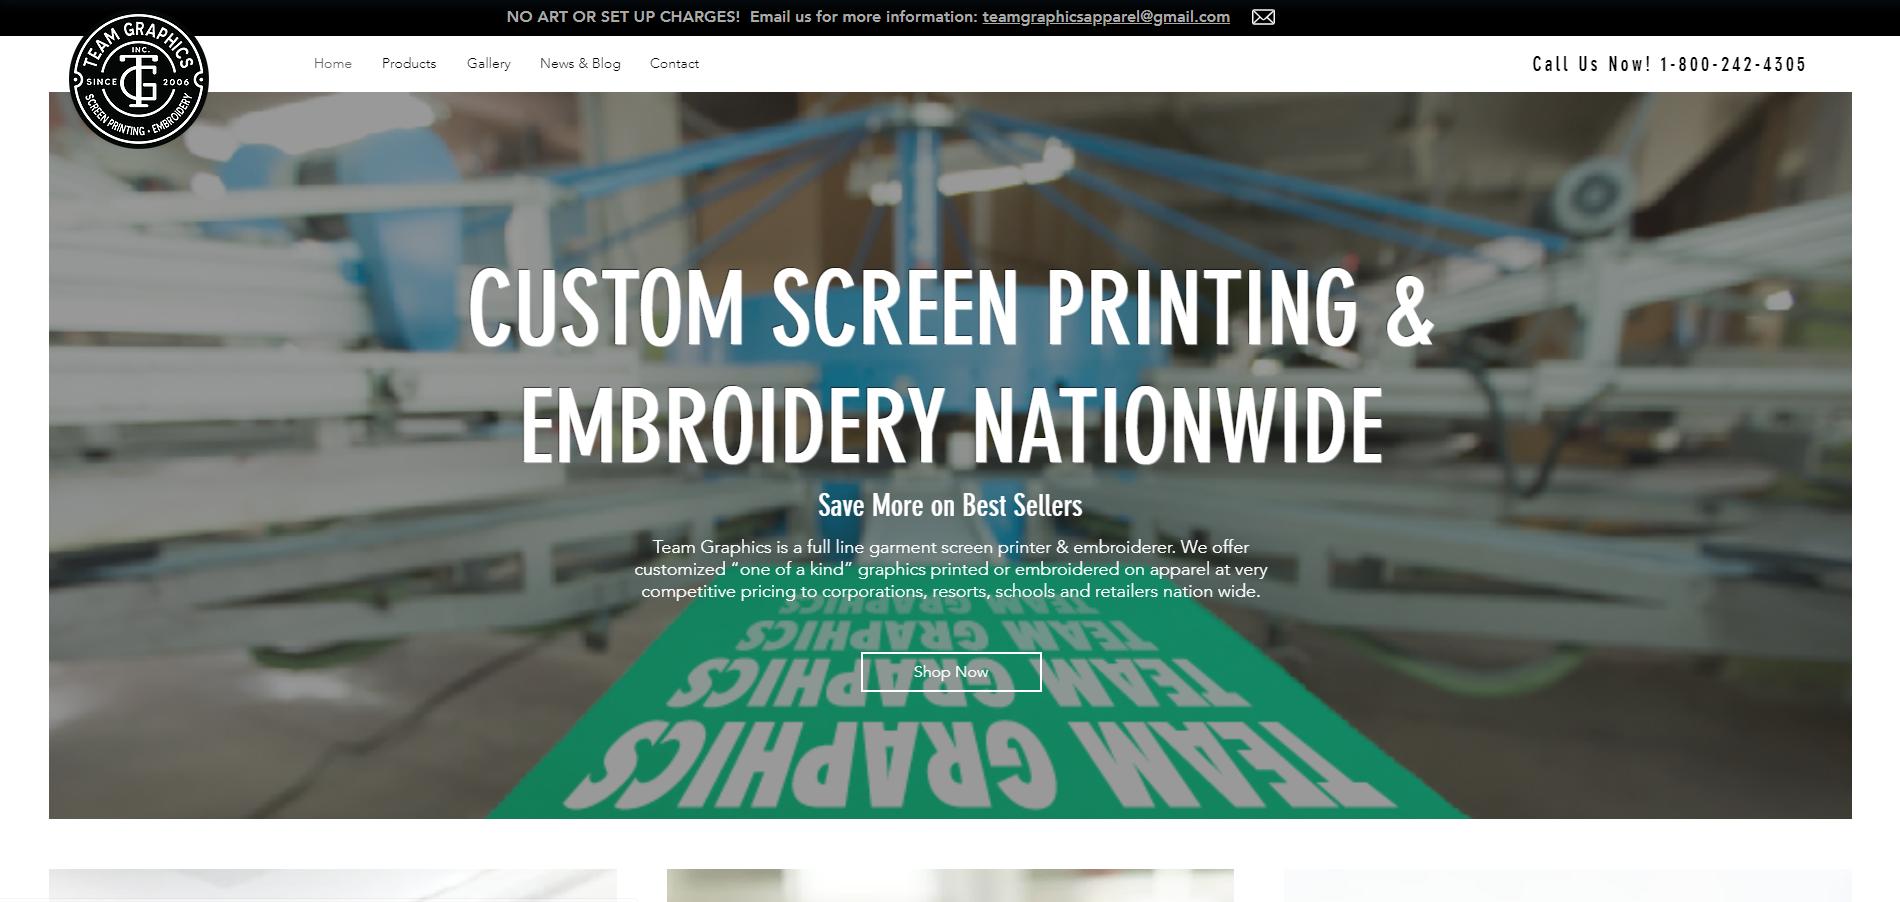 ee8a12c3 Custom Screen Printing | Team Graphics, Inc. | United States